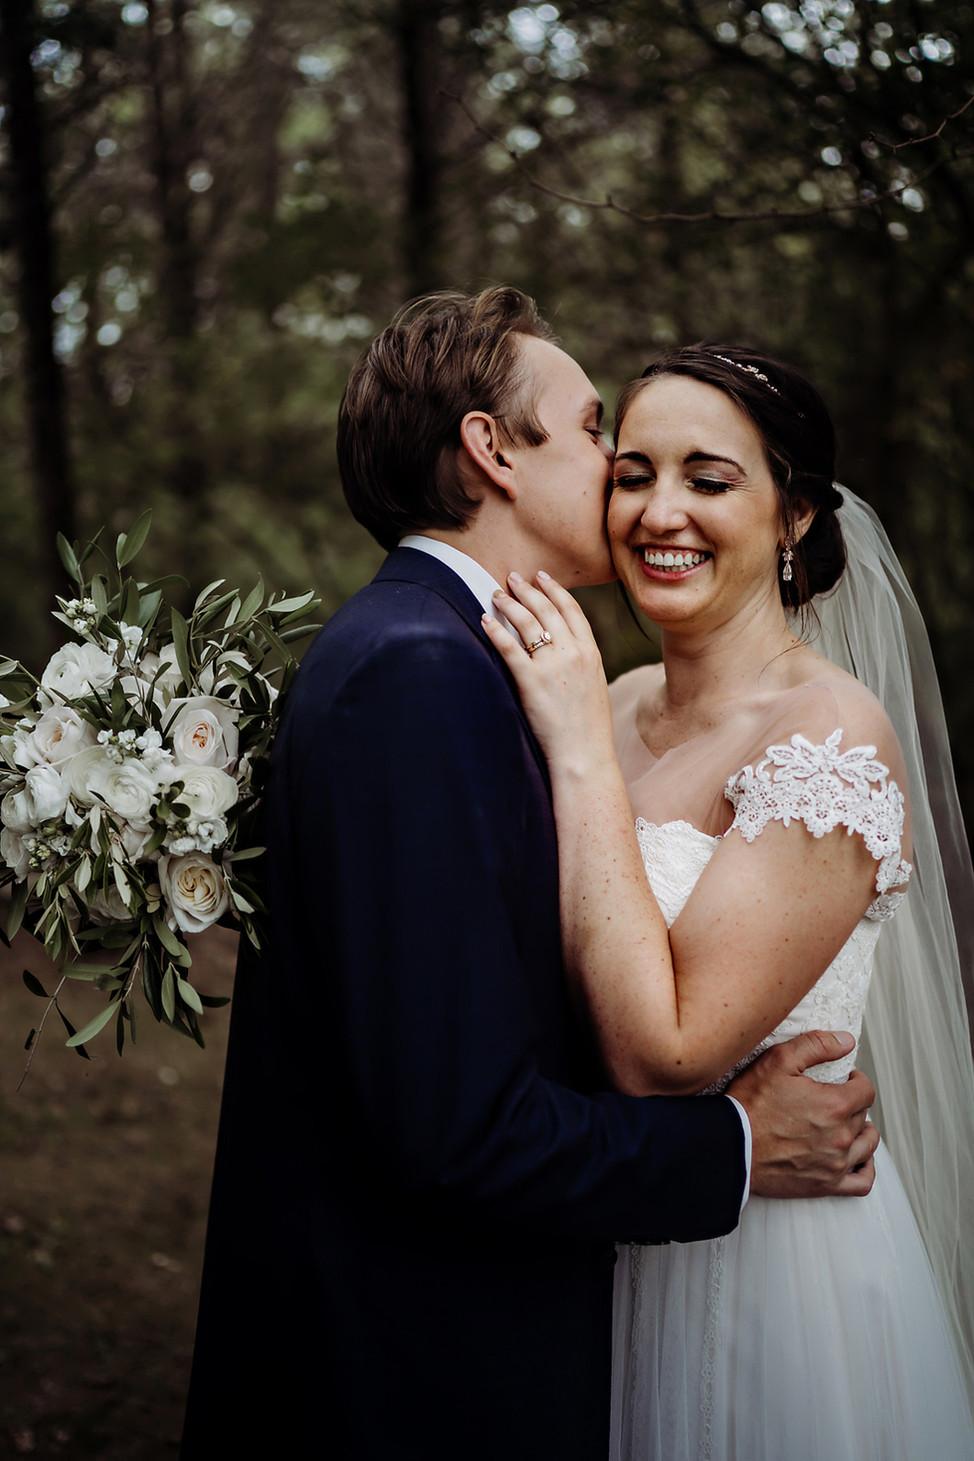 Travis + Paige    Wedding at Cedar Spring Pavilion